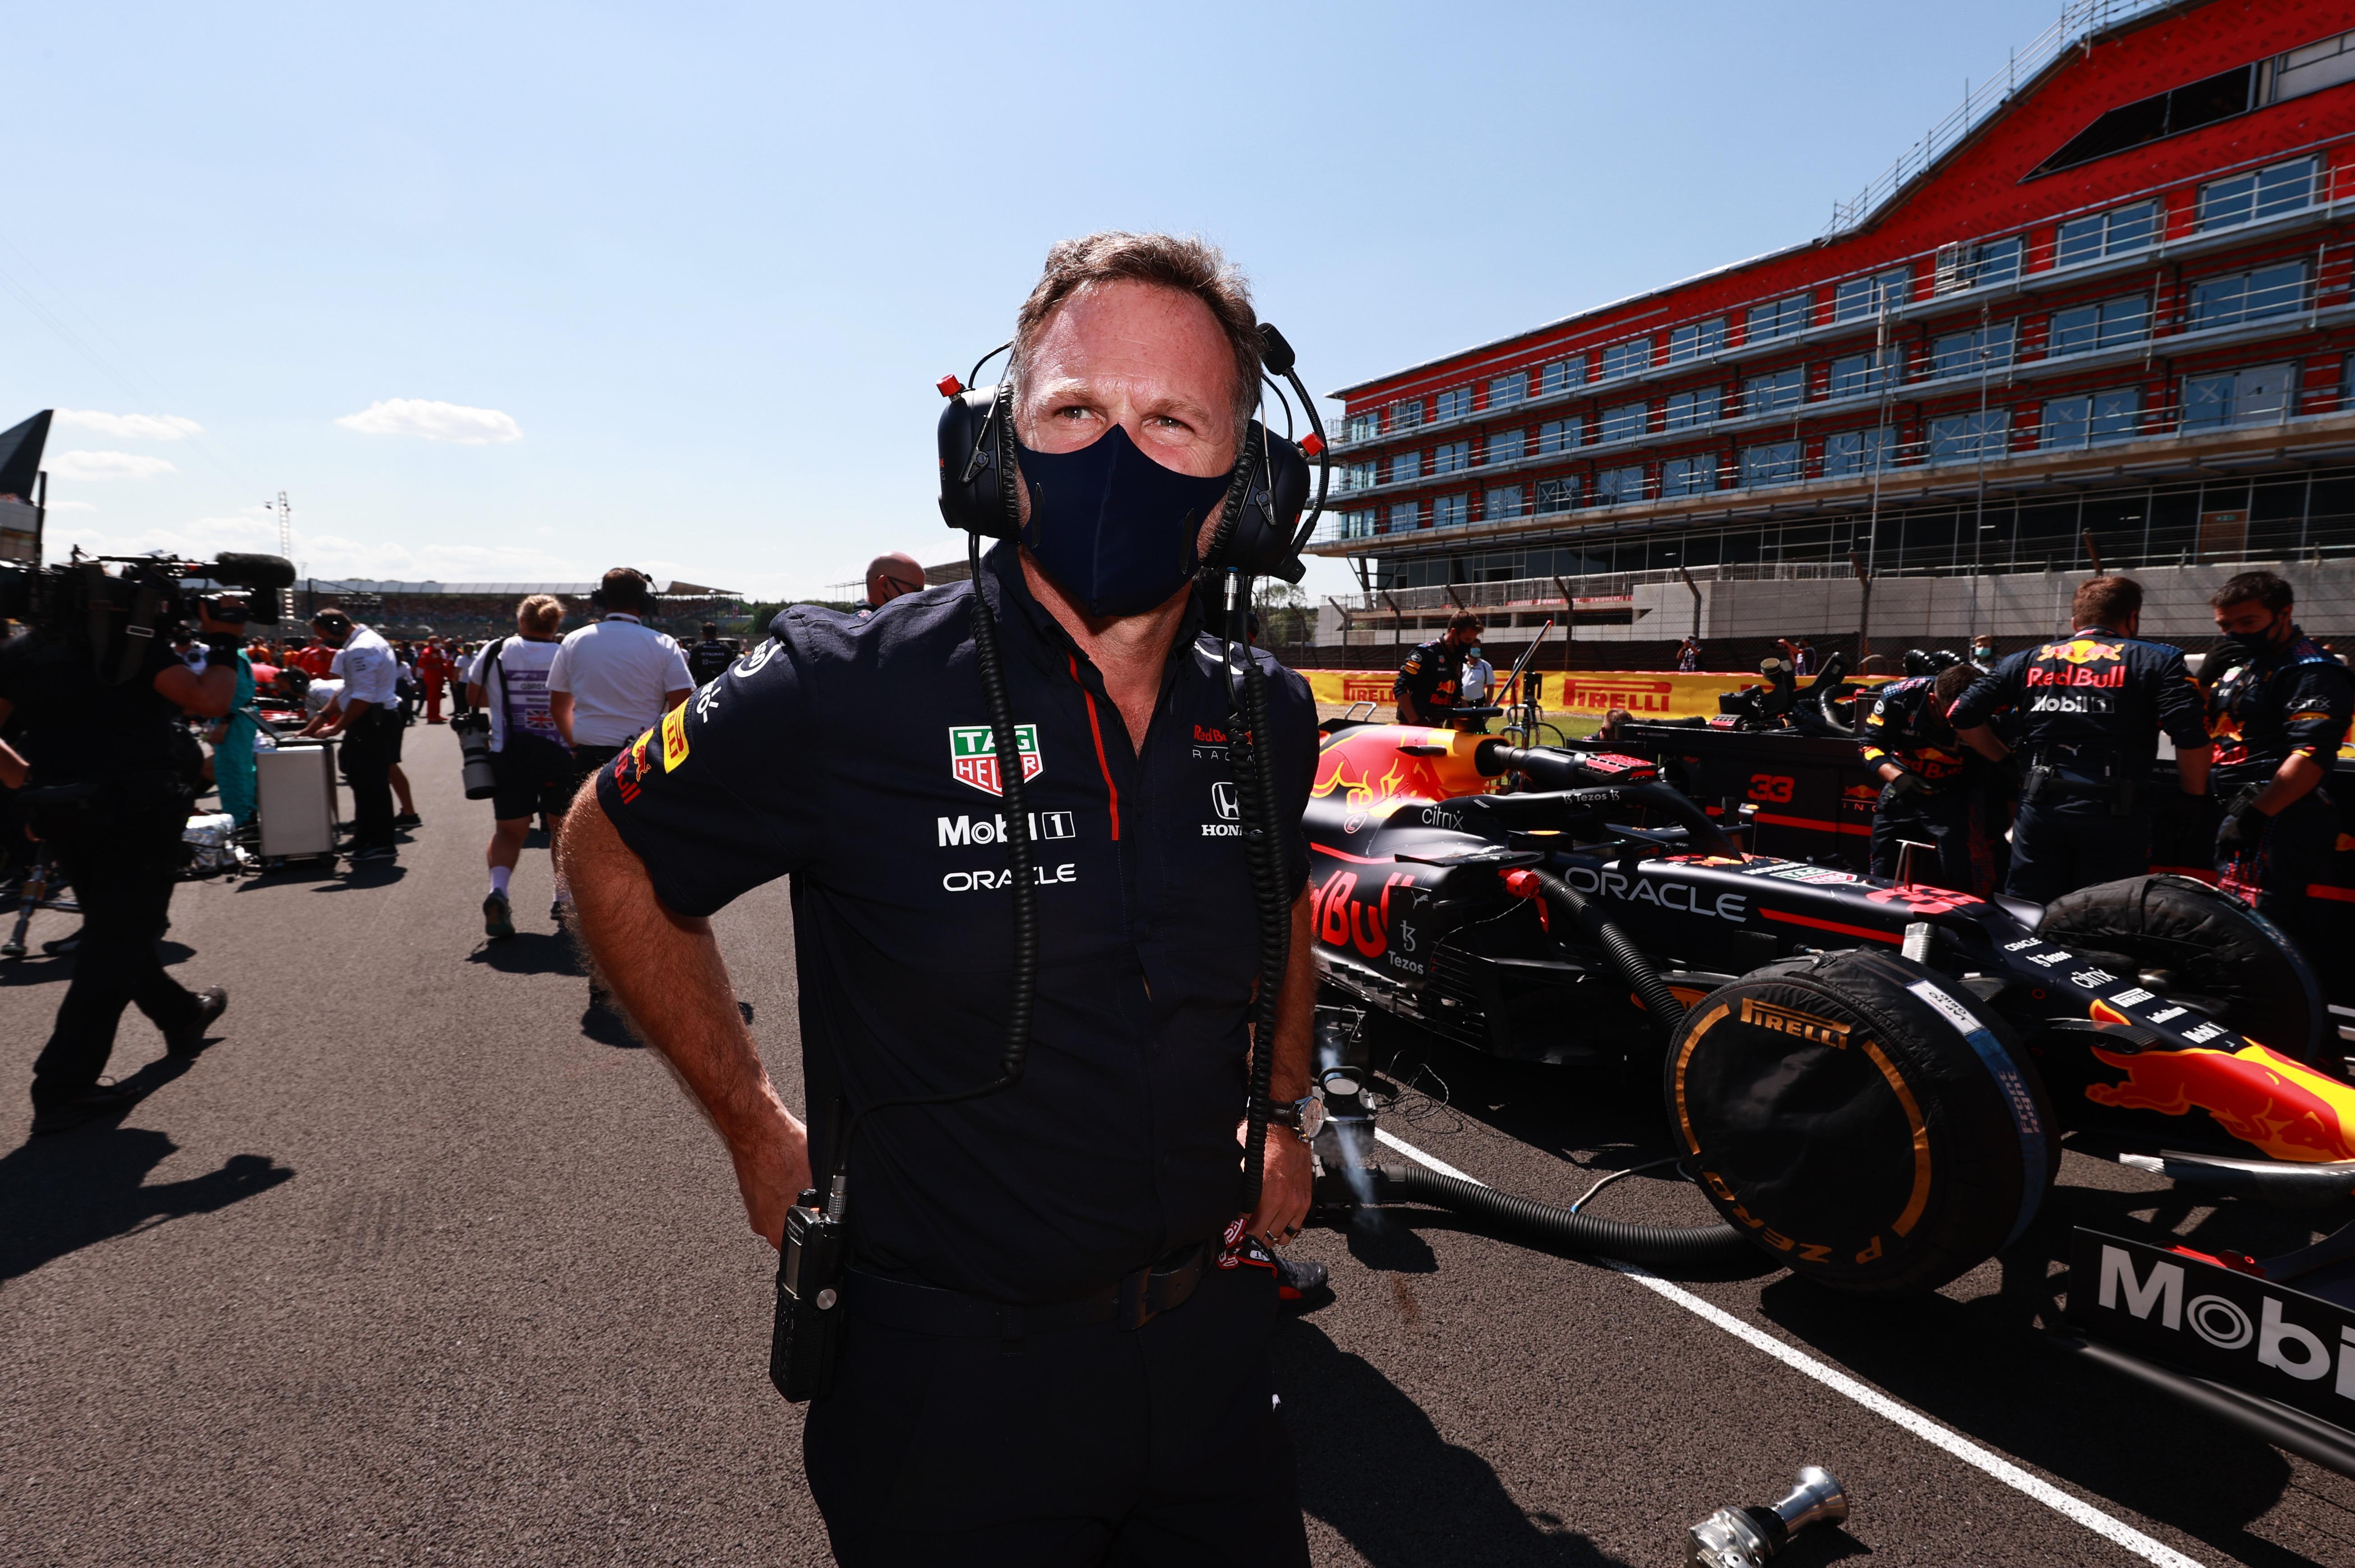 Christian Horner, British GP grid